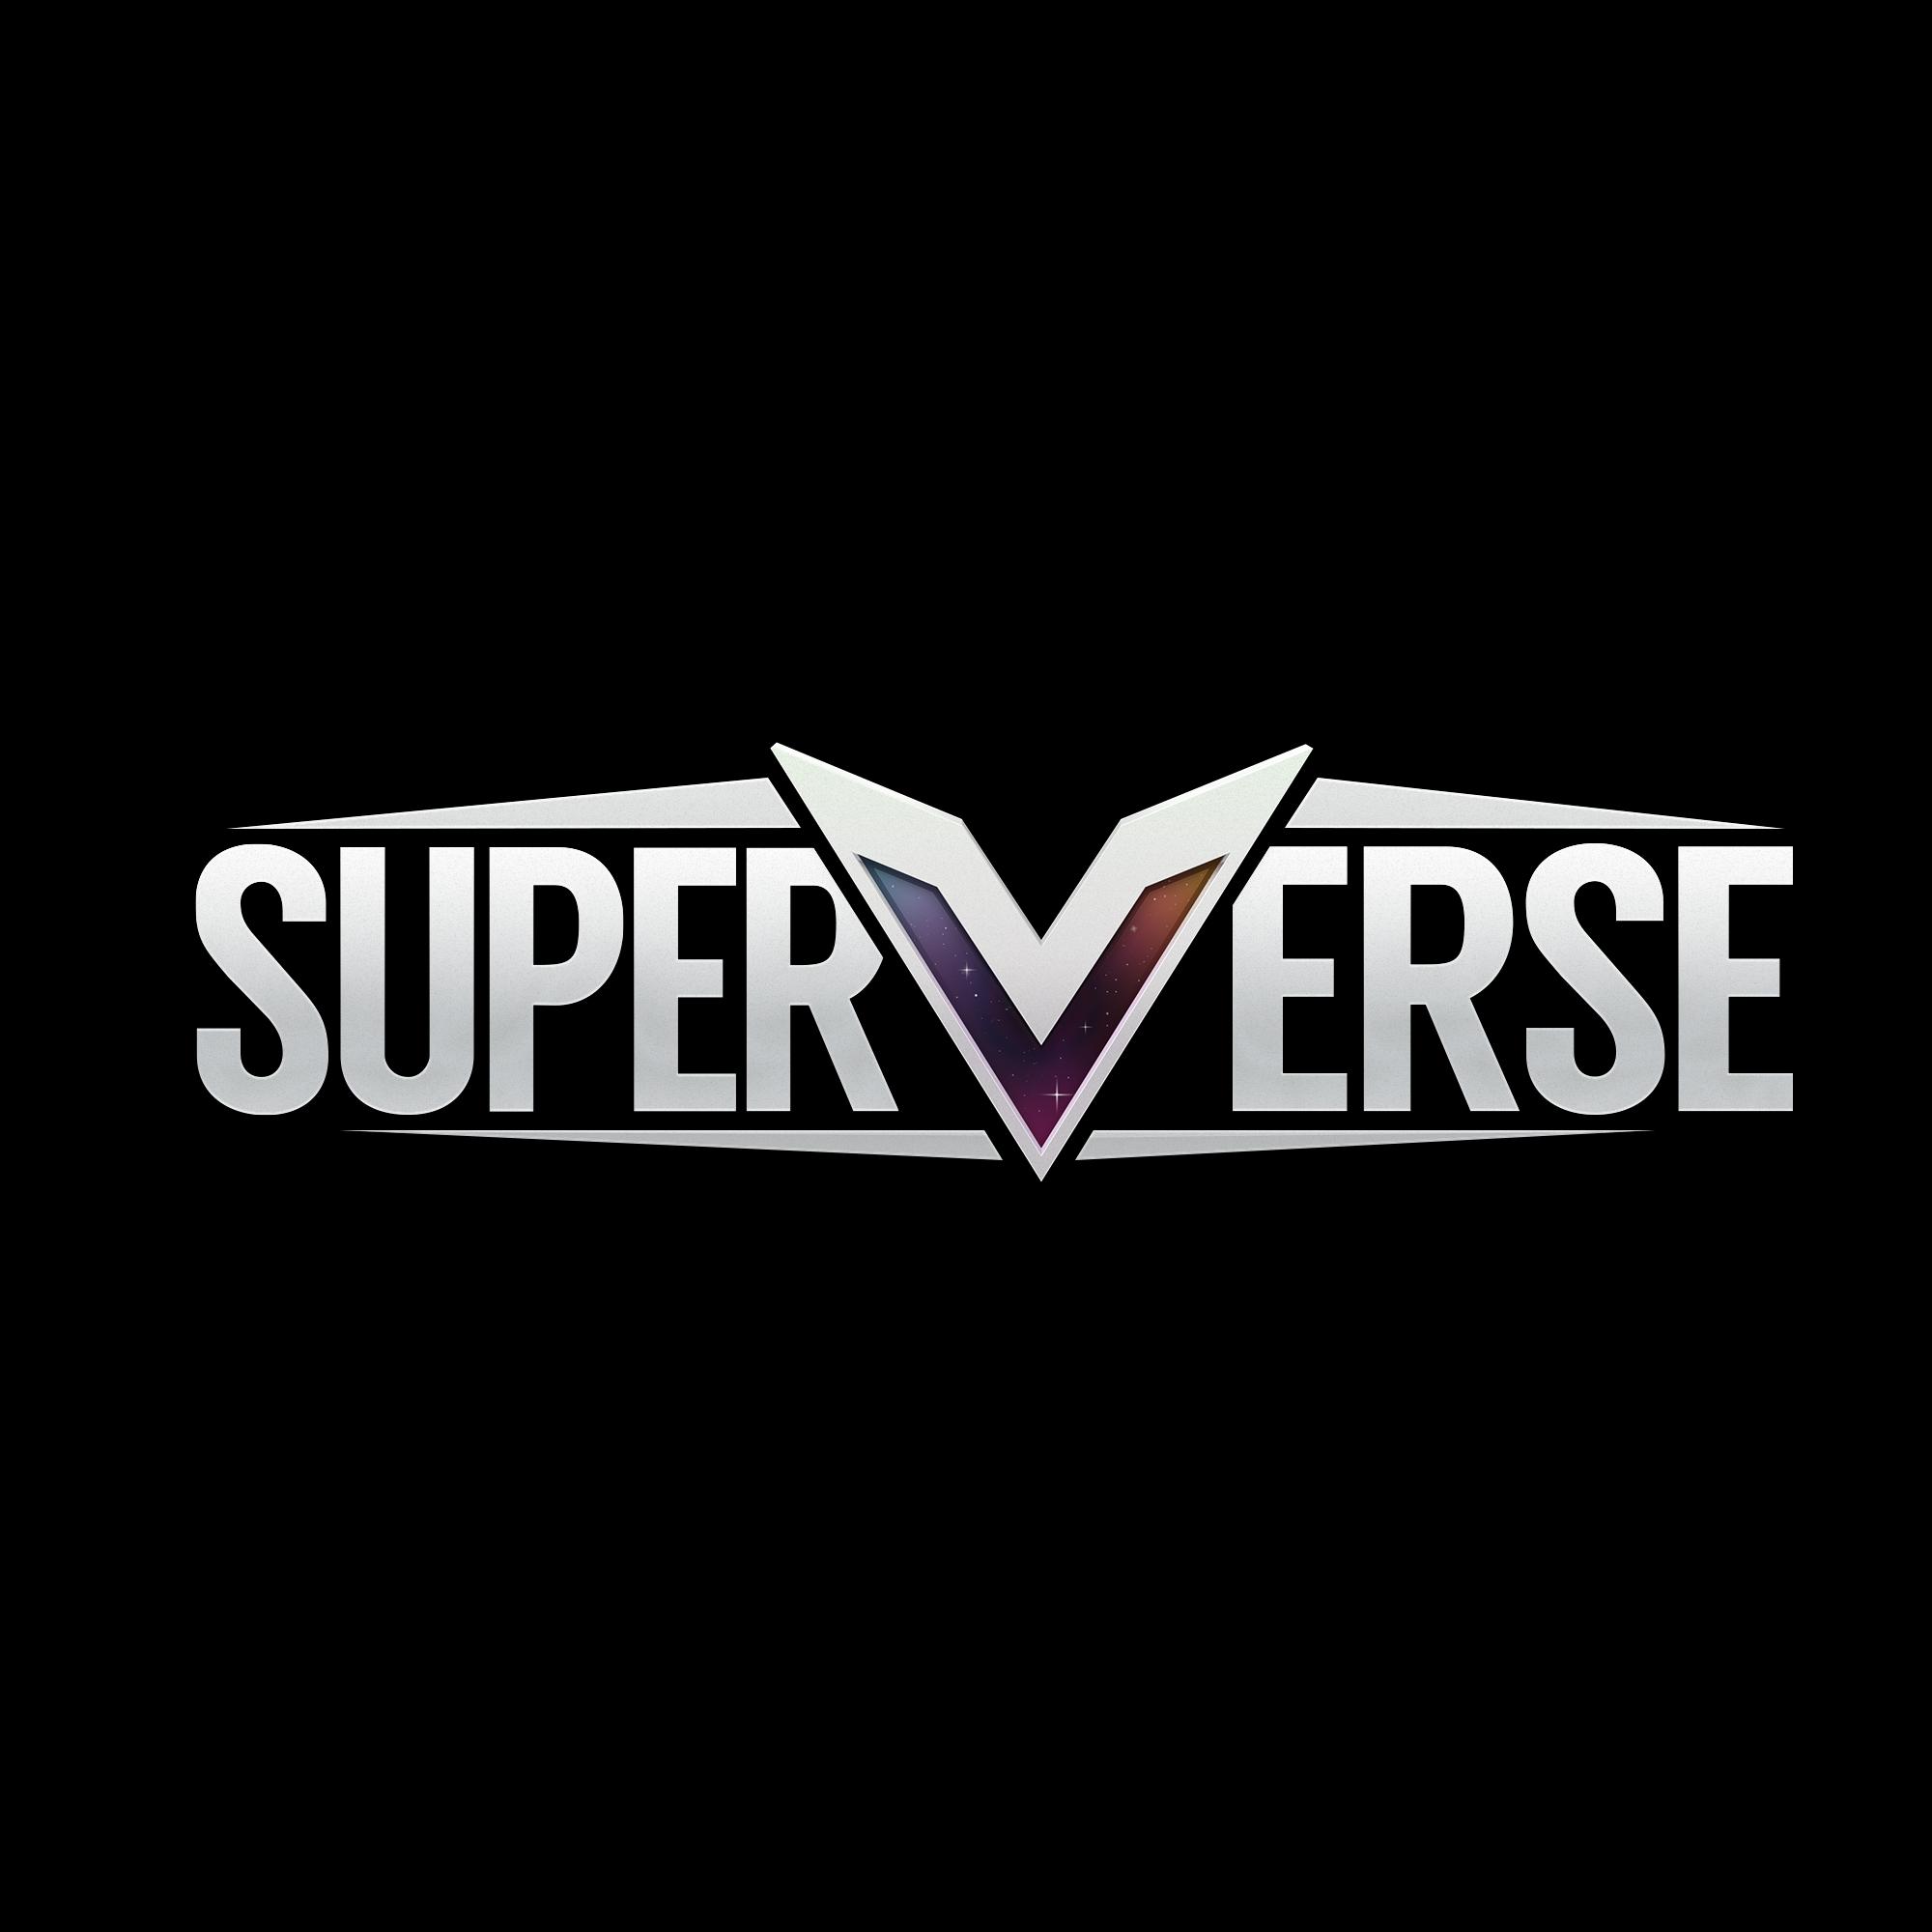 Superverse-LOGO_2016